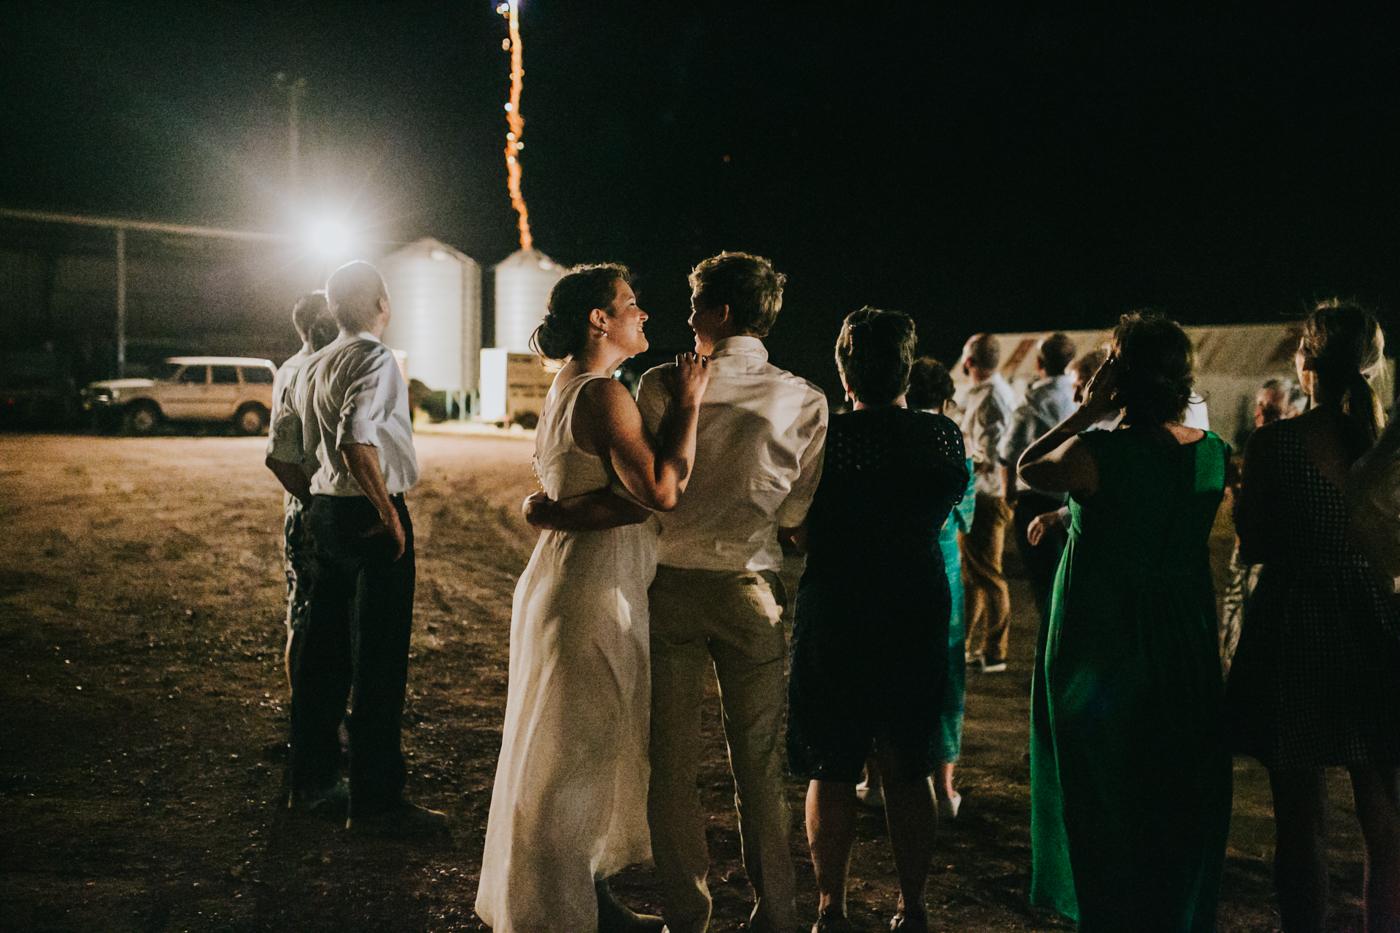 Nicolle & Jacob - Dubbo Wedding - Country Australia - Samantha Heather Photography-313.jpg